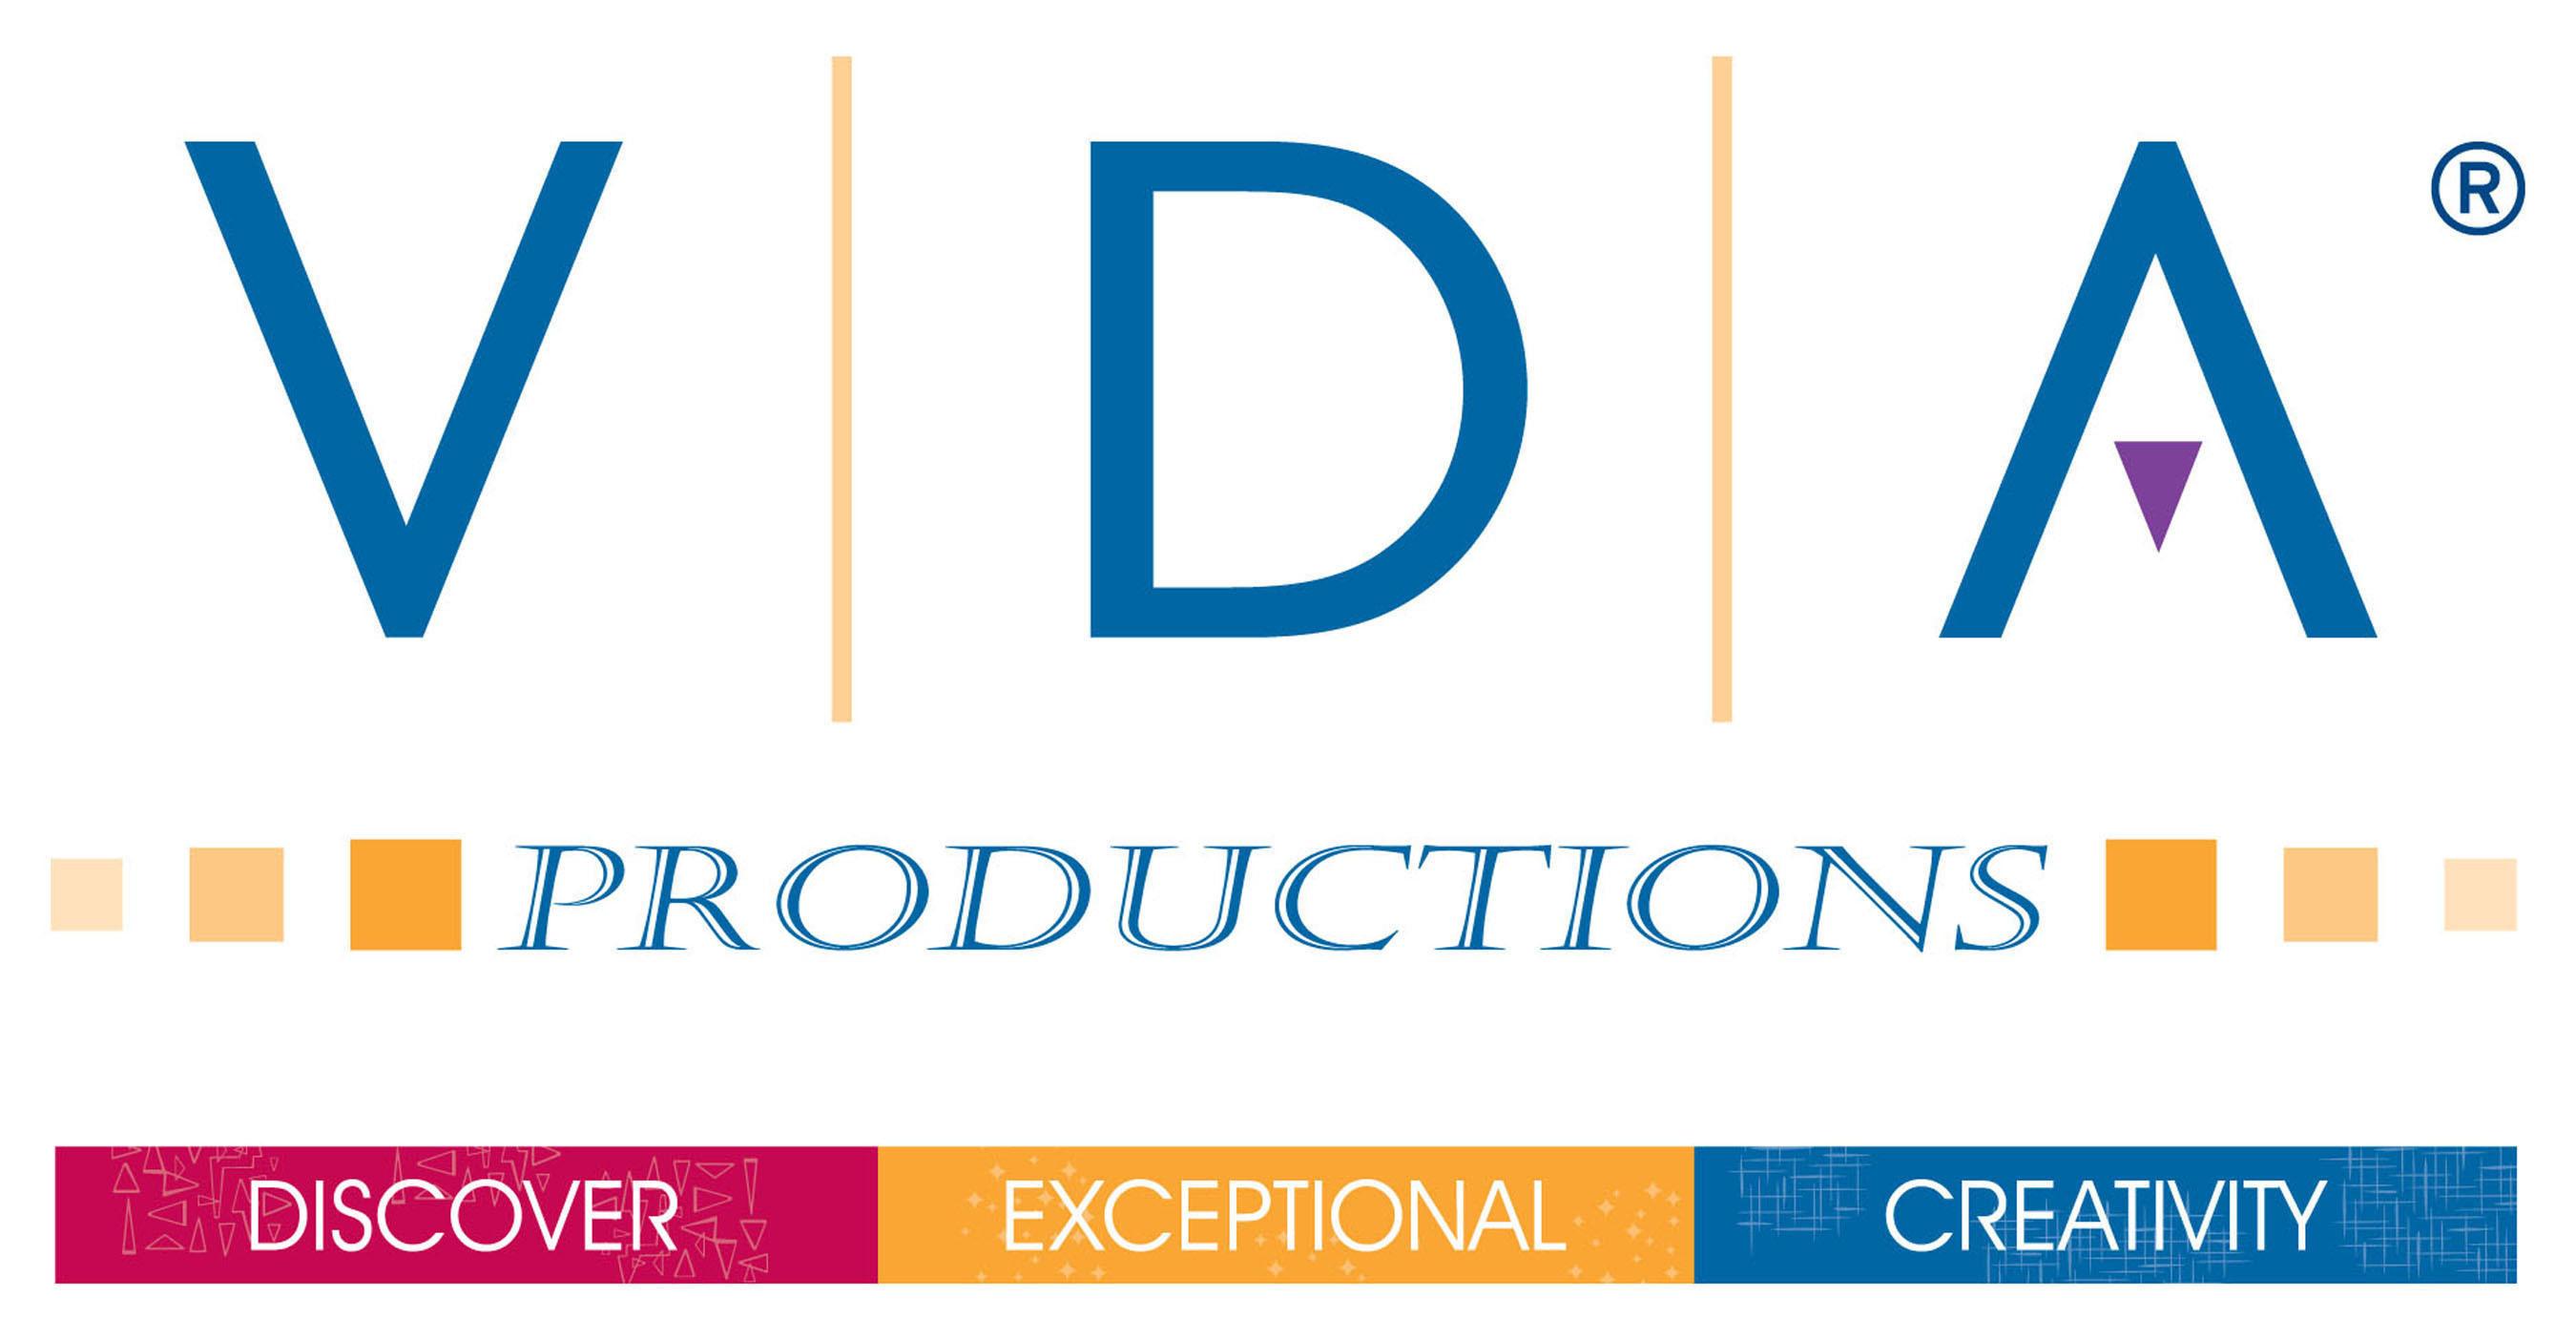 VDA Productions logo. (PRNewsFoto/VDA Productions)